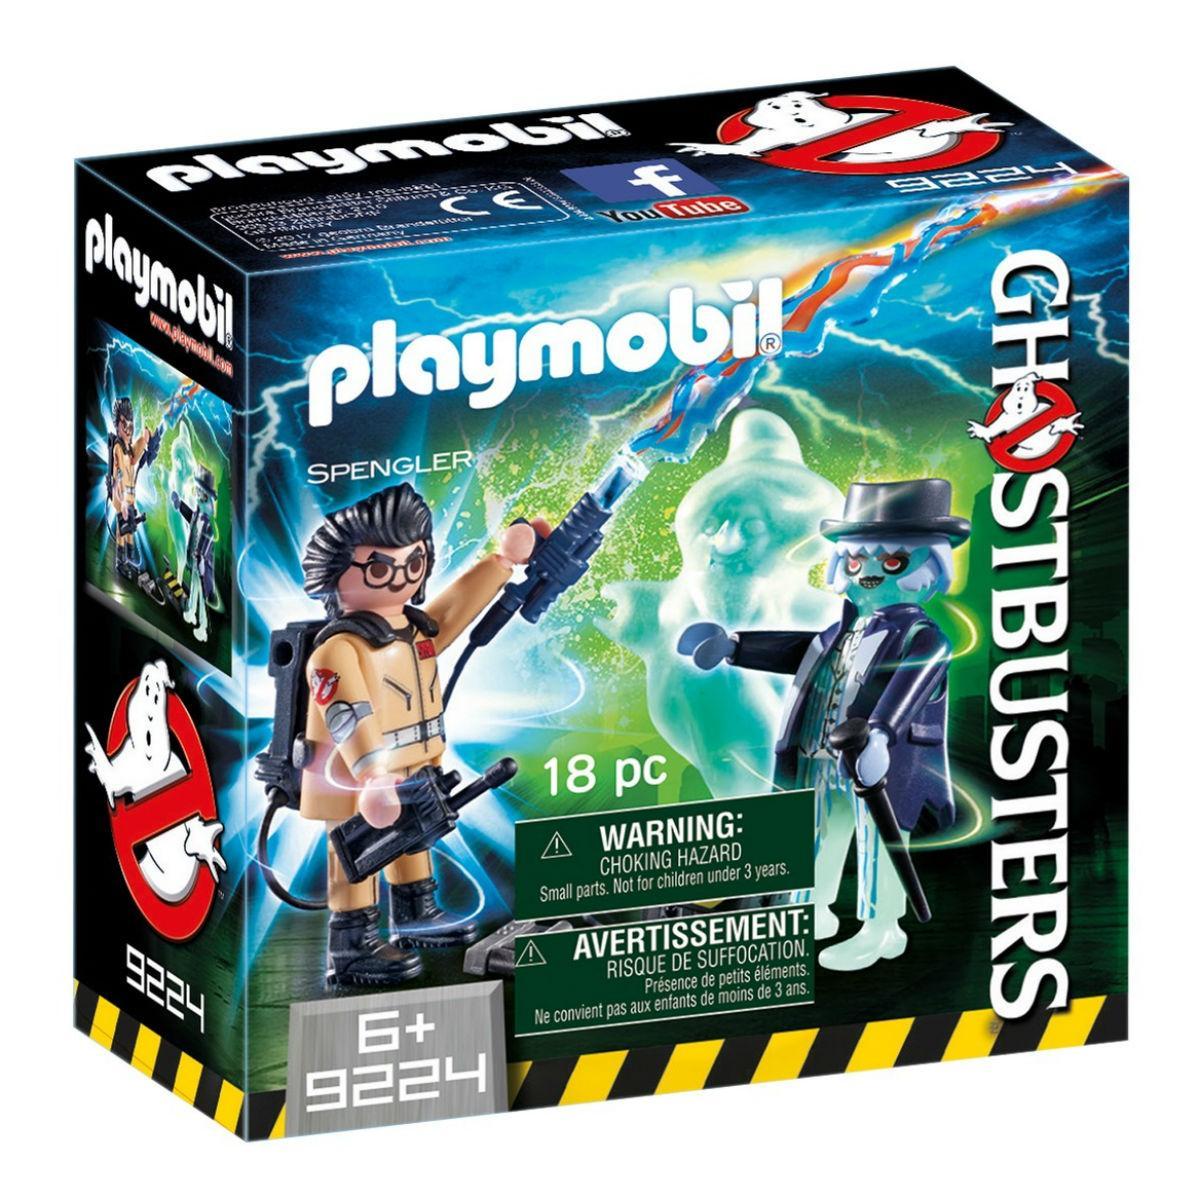 PLAYMOBIL - GHOSTBUSTERS - SPENGLER - 9224